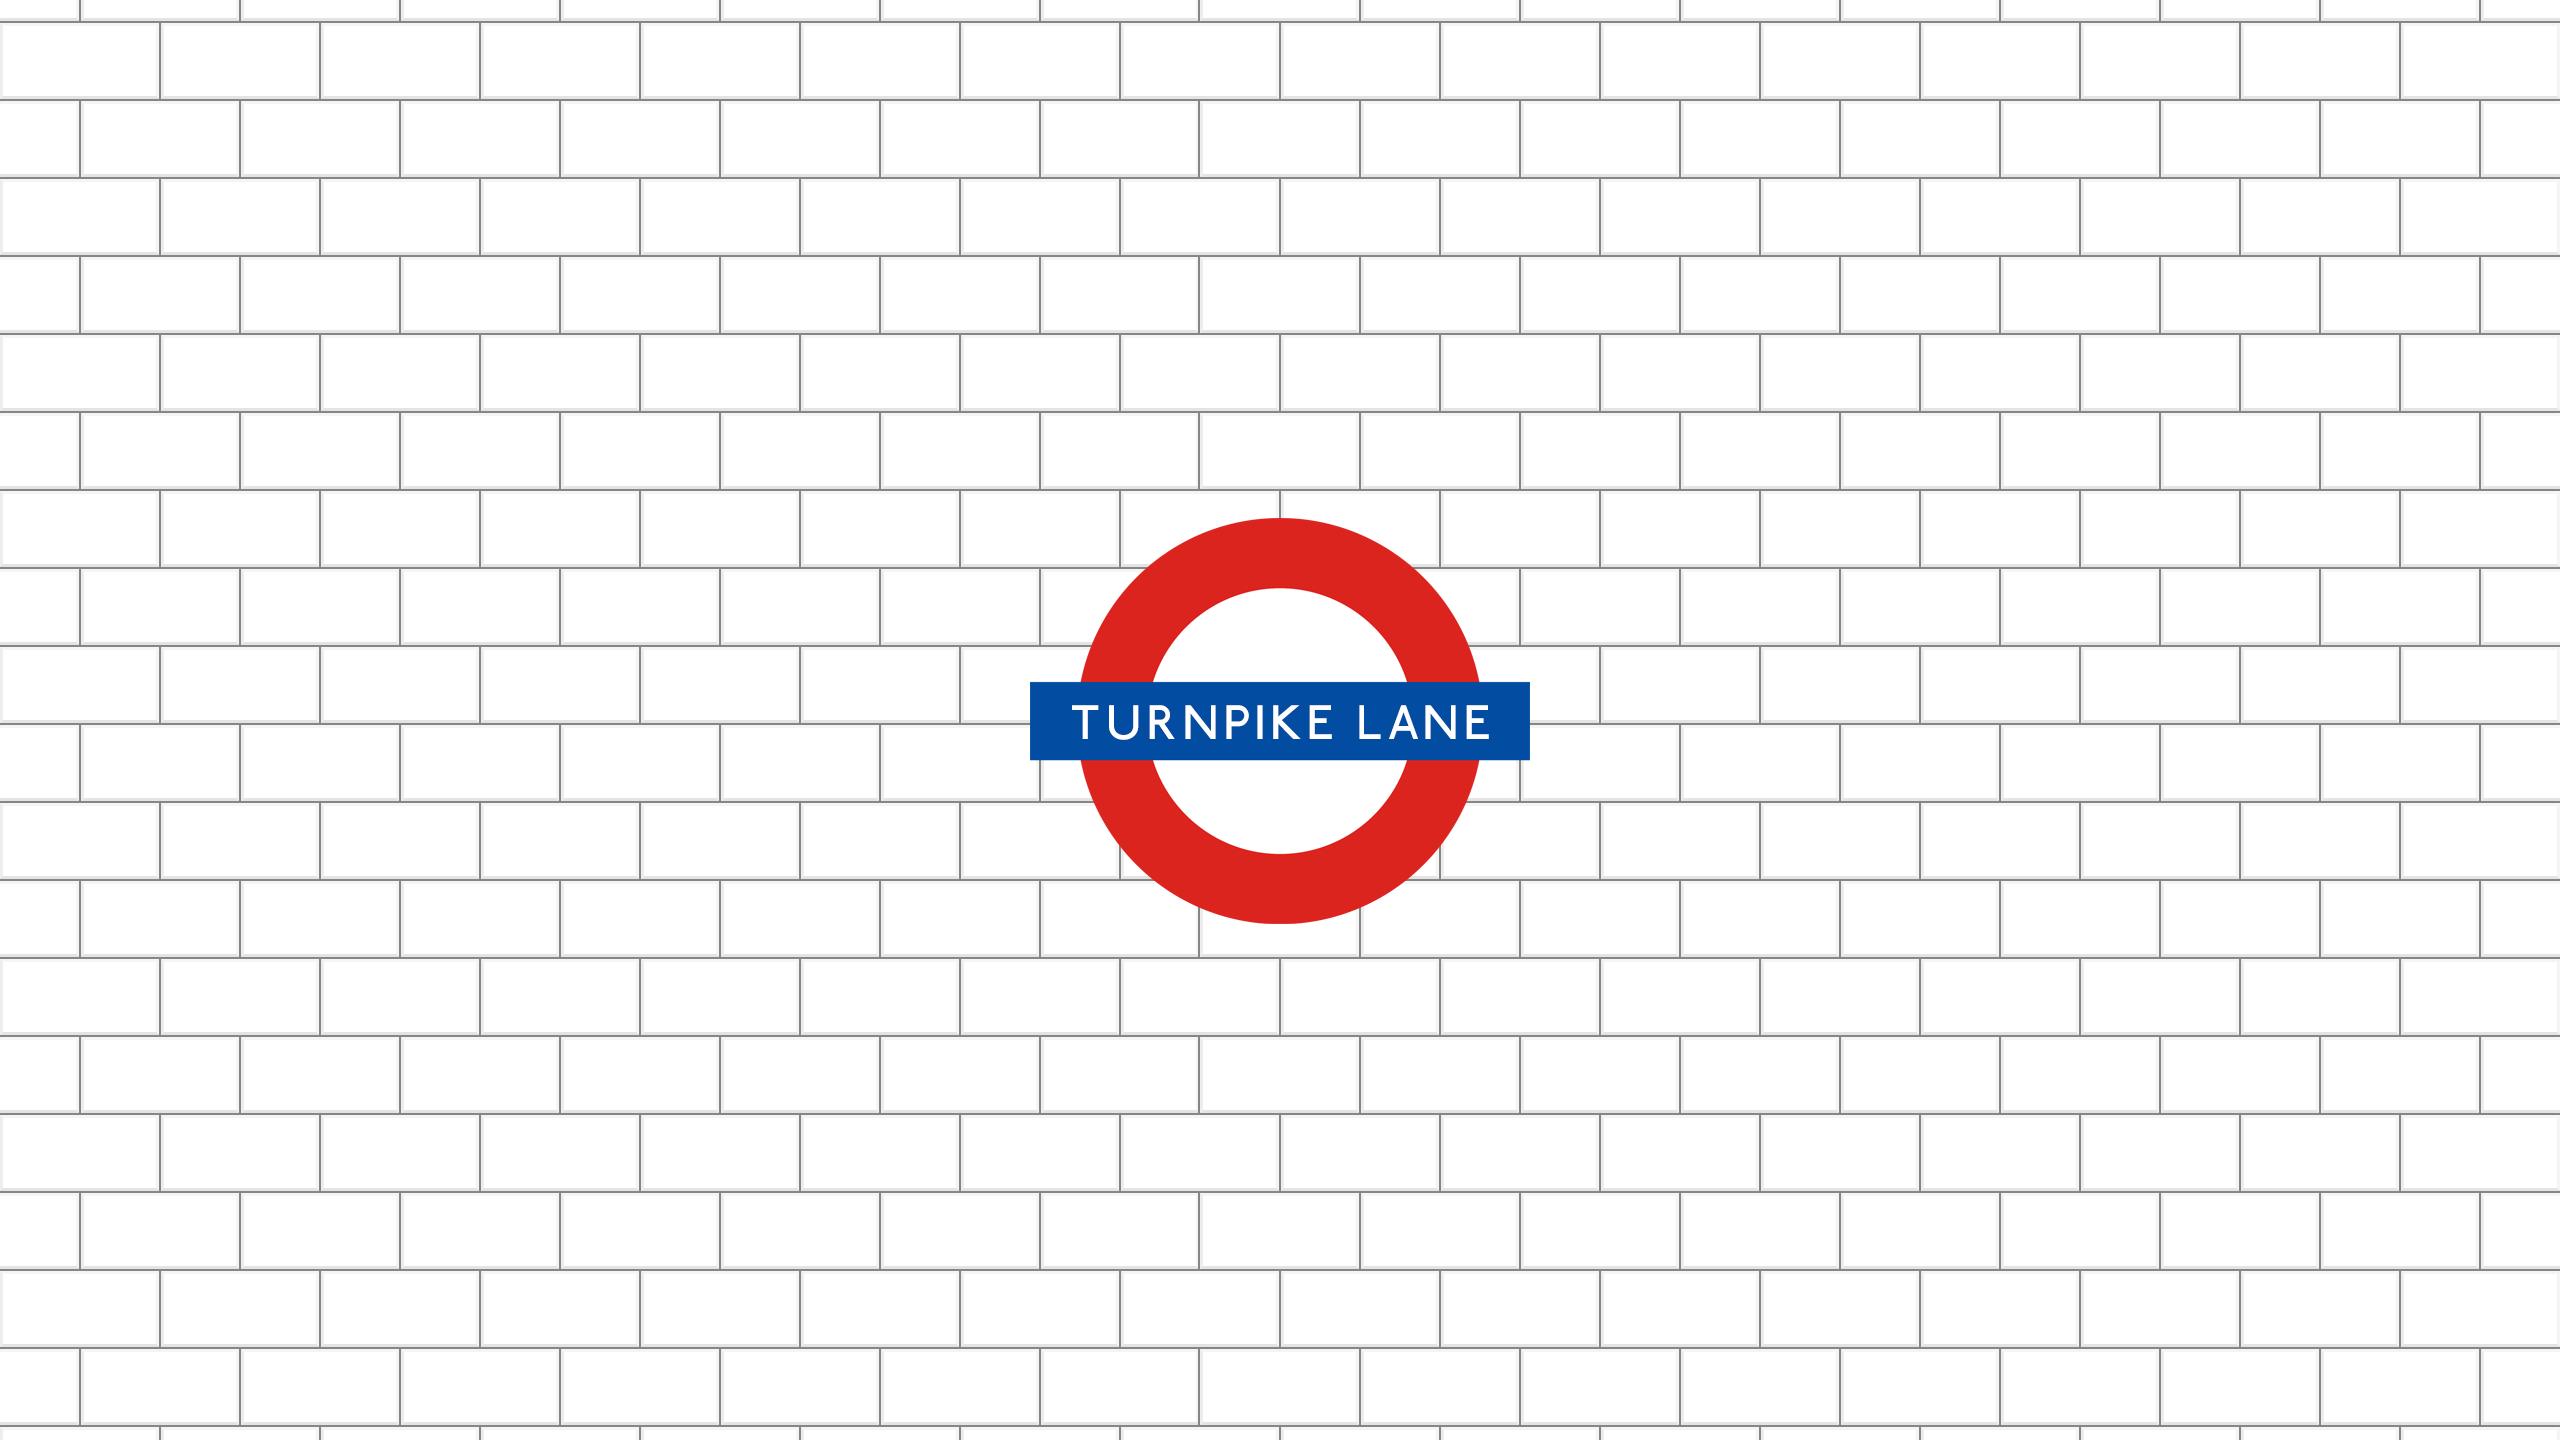 Turnpike Lane